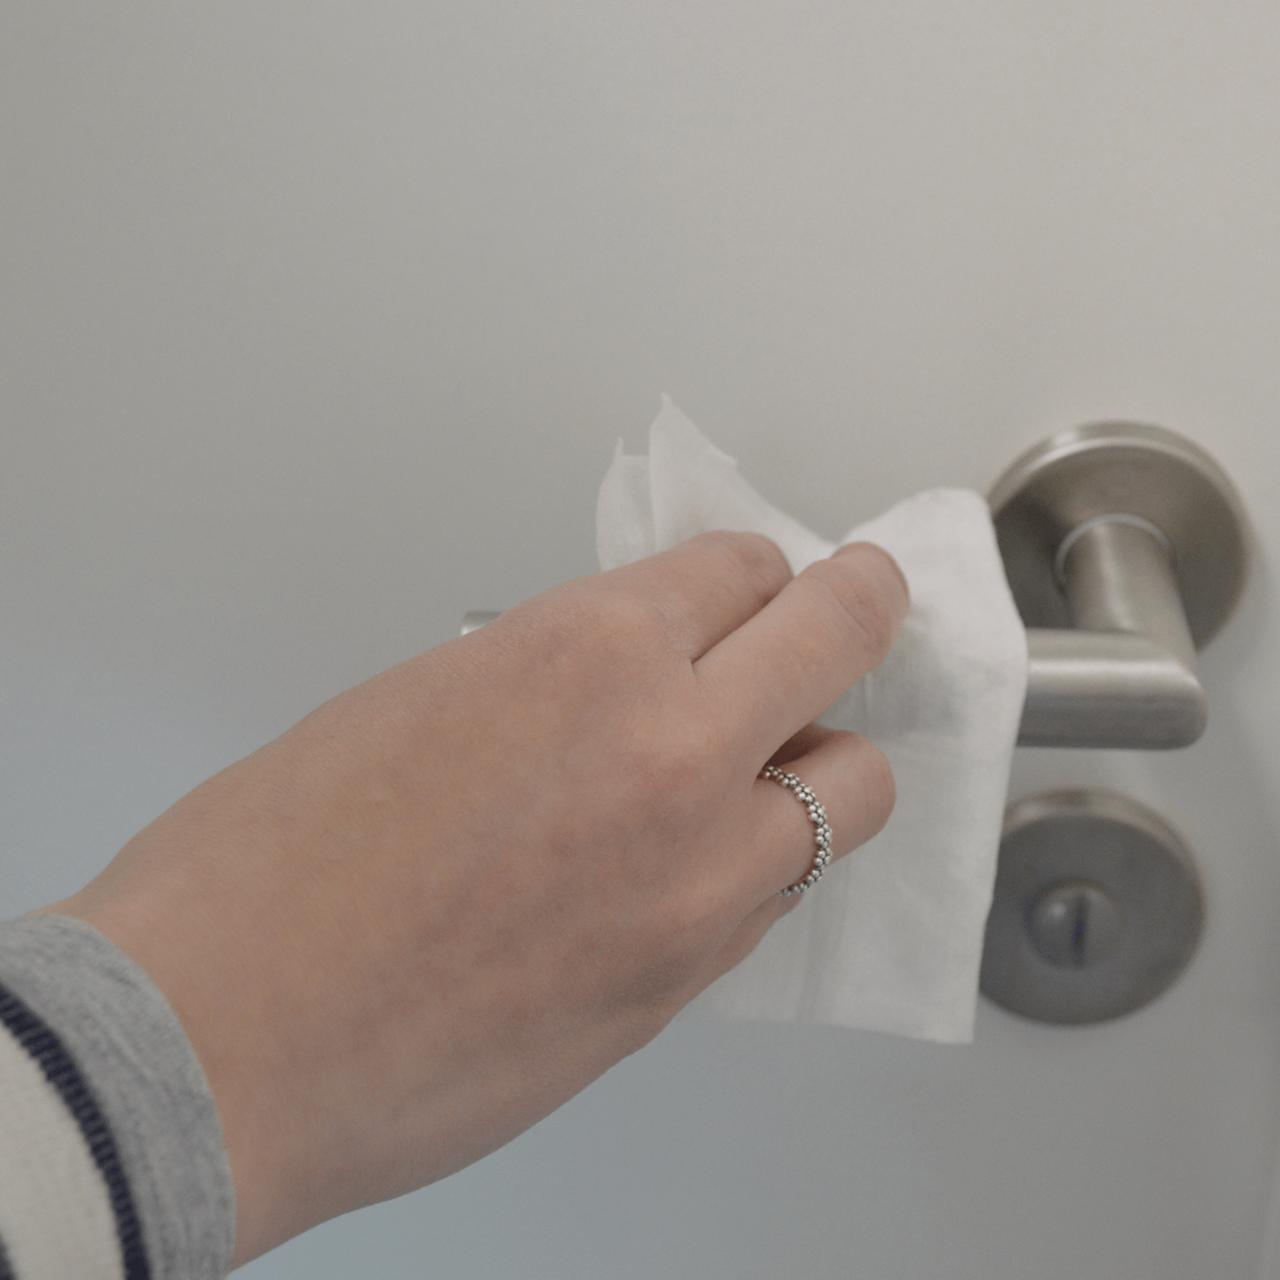 Desinfektionstücher Dictum soft-wipe (MB 6) Bild 3